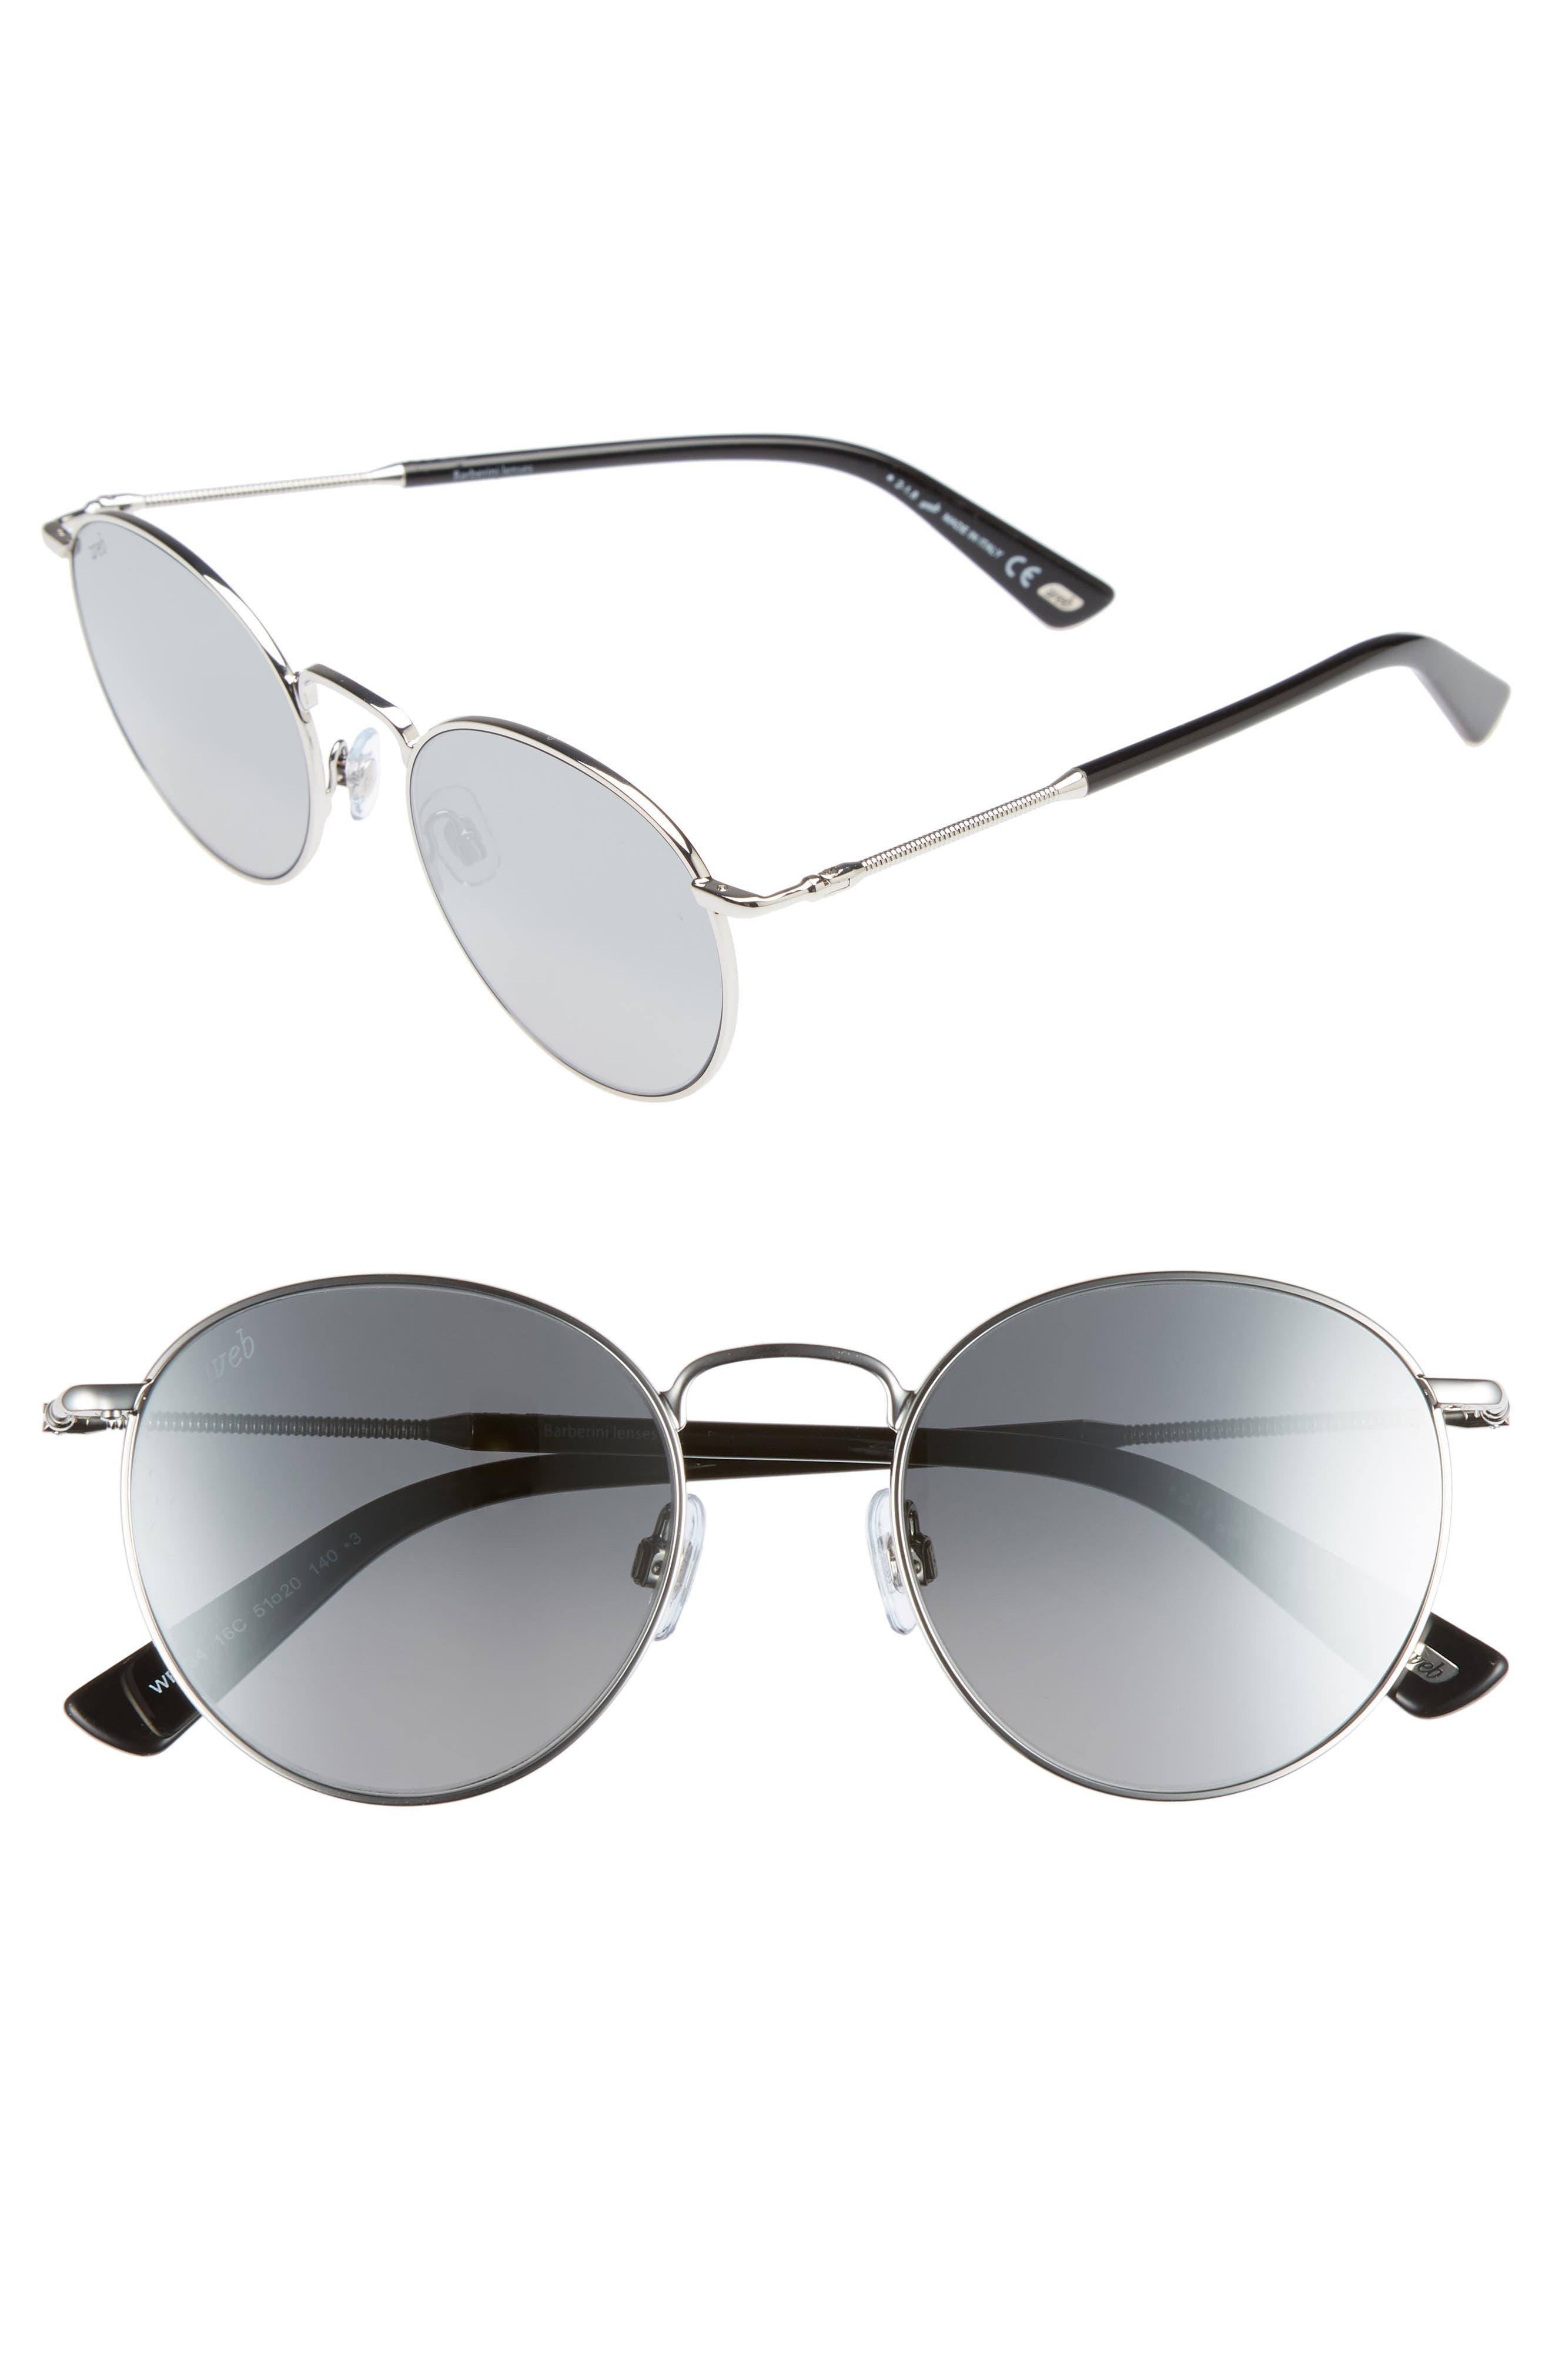 51mm Round Metal Sunglasses,                         Main,                         color, Shiny Palladium/ Smoke Mirror